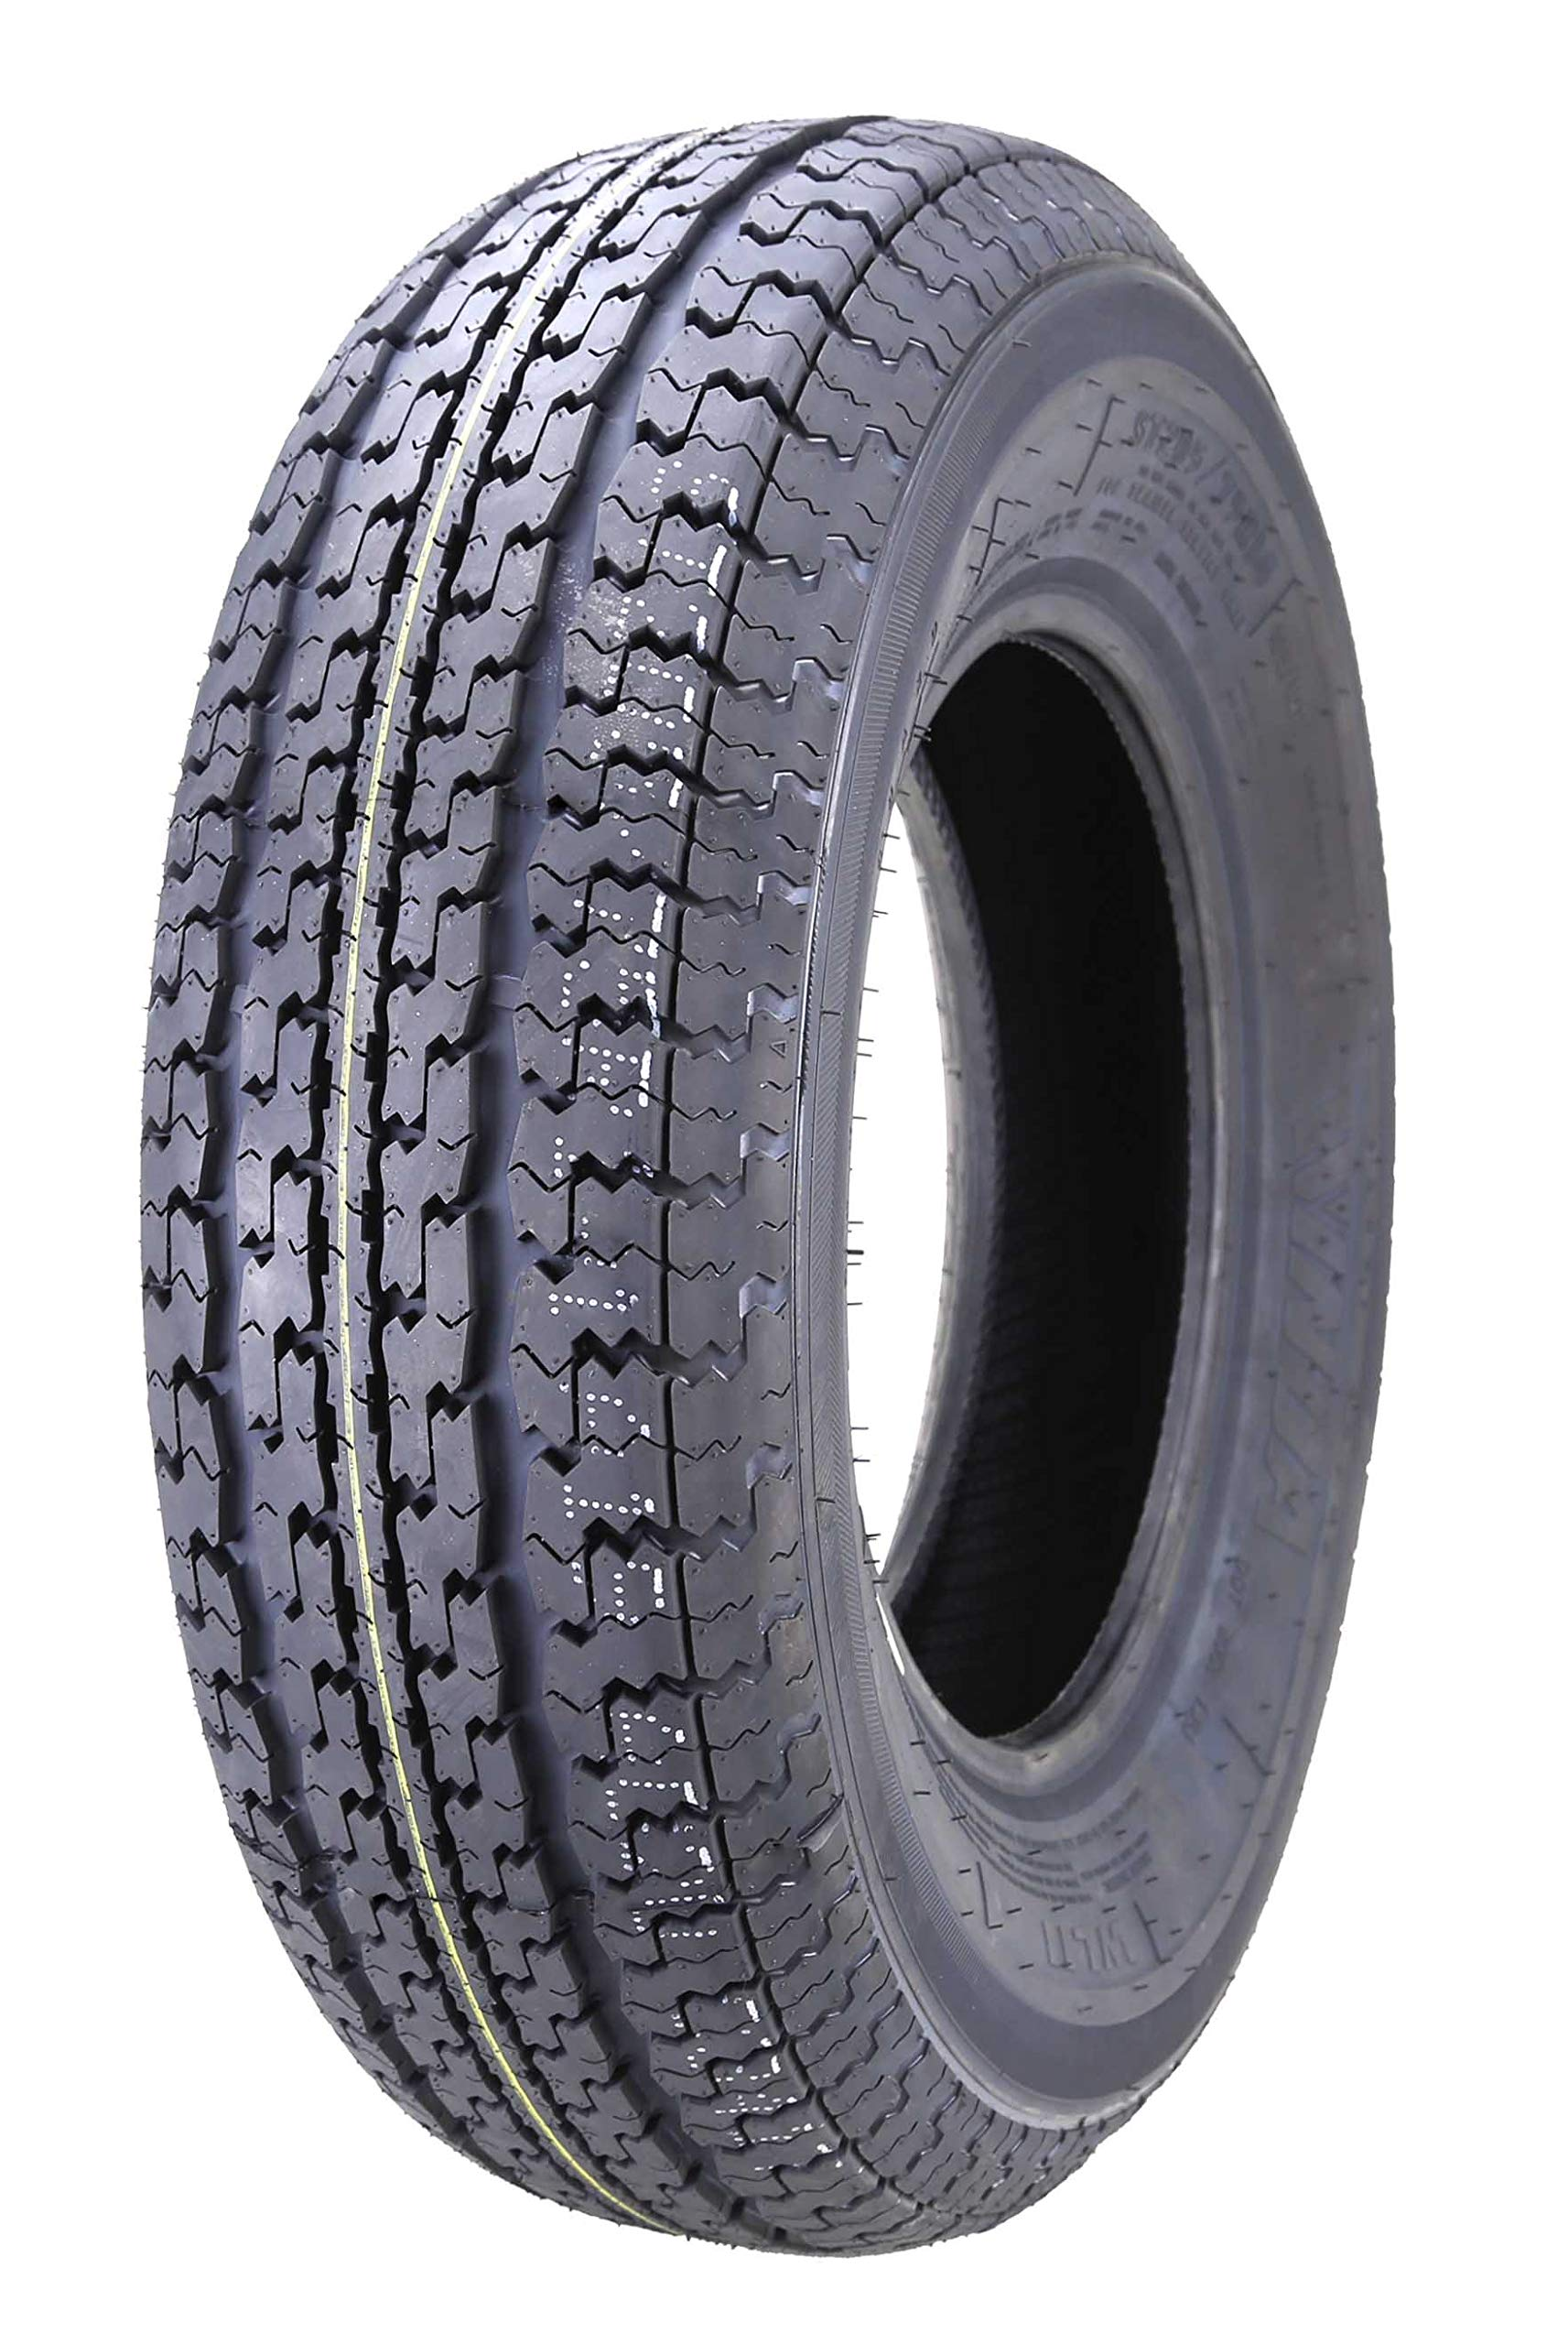 One New Premium WINDA Trailer Tire ST205 75R14 / 8PR Load Range D